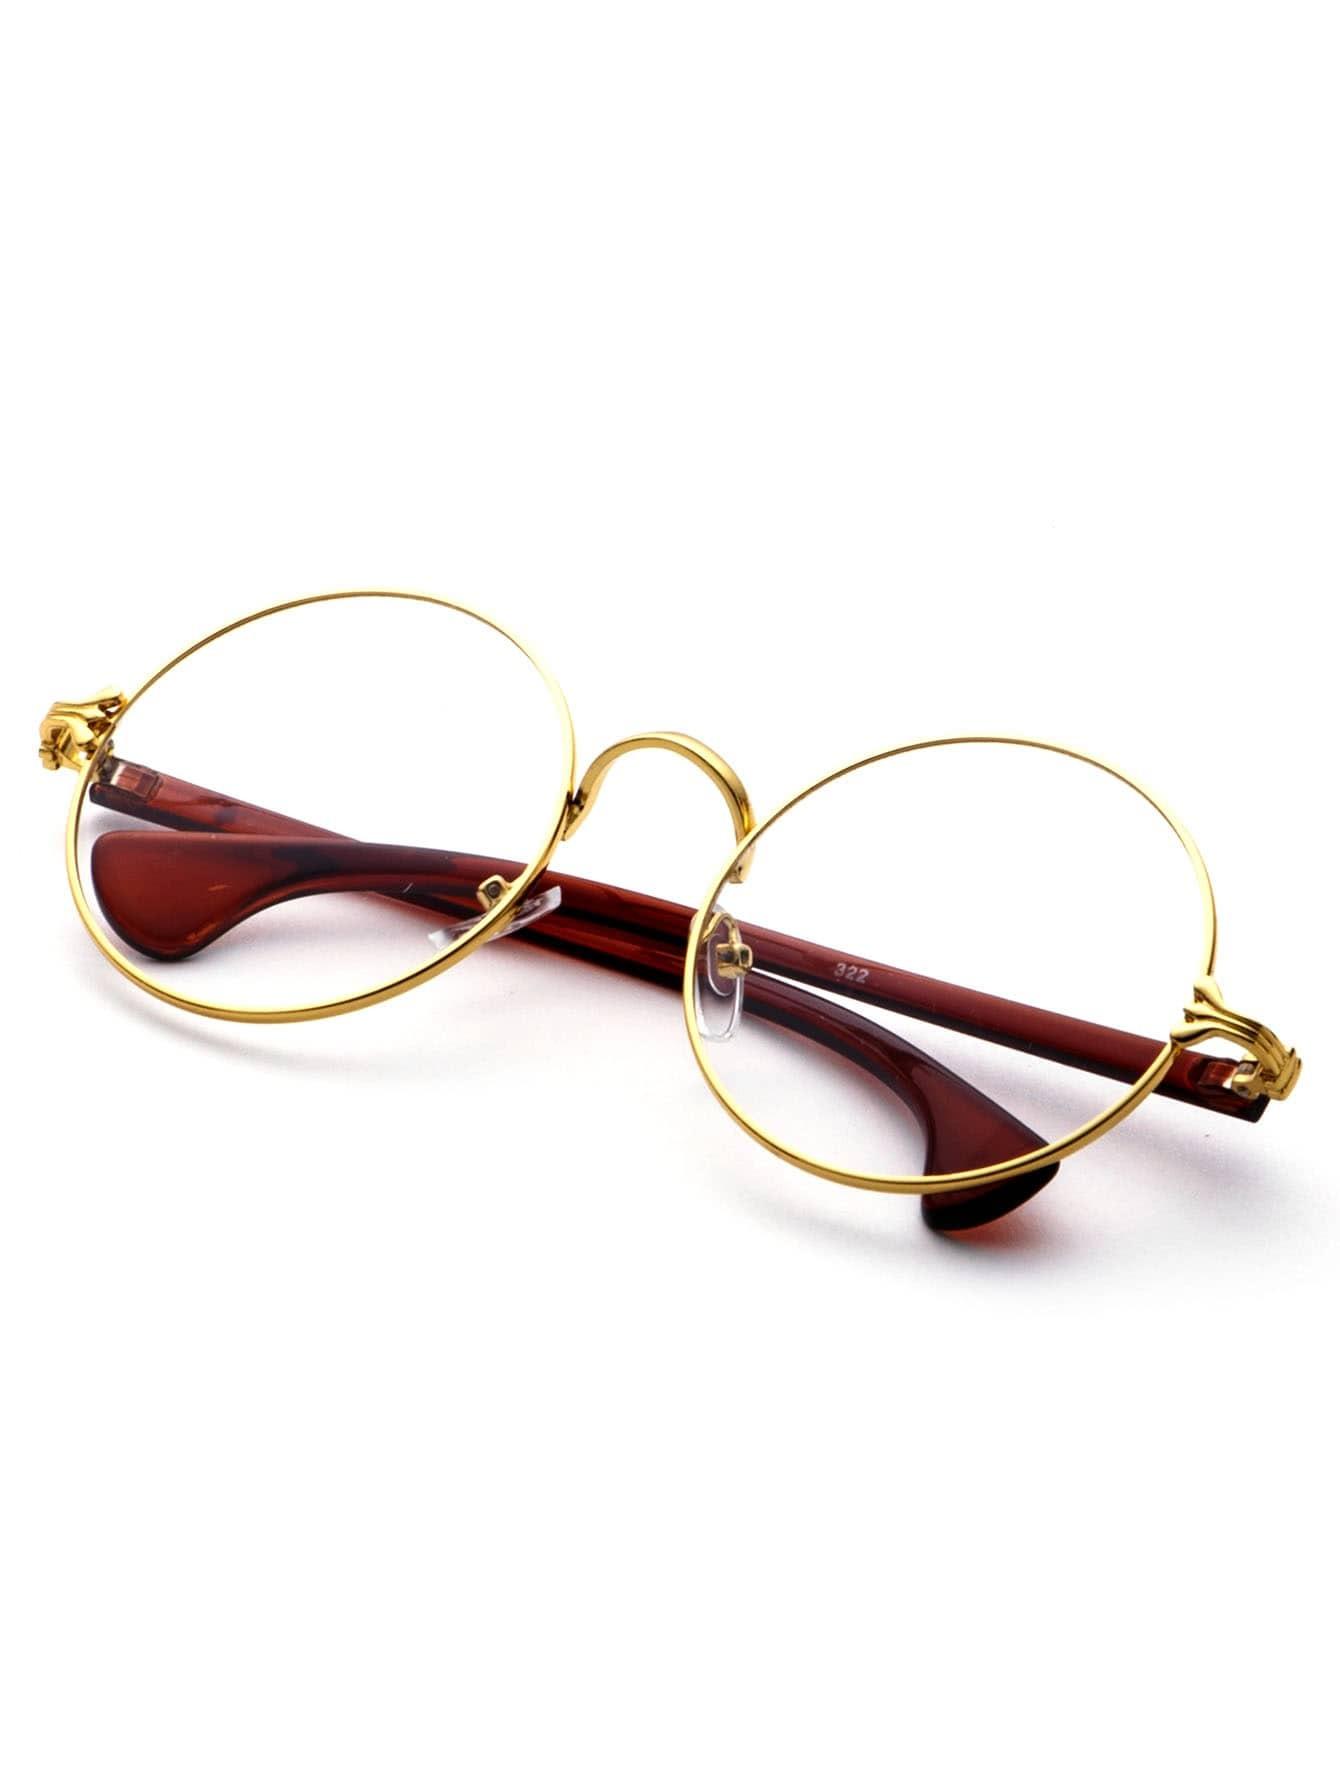 Round Glasses Gold Frames : Gold Frame Contrast Arm Round Lens Glasses -SheIn(Sheinside)